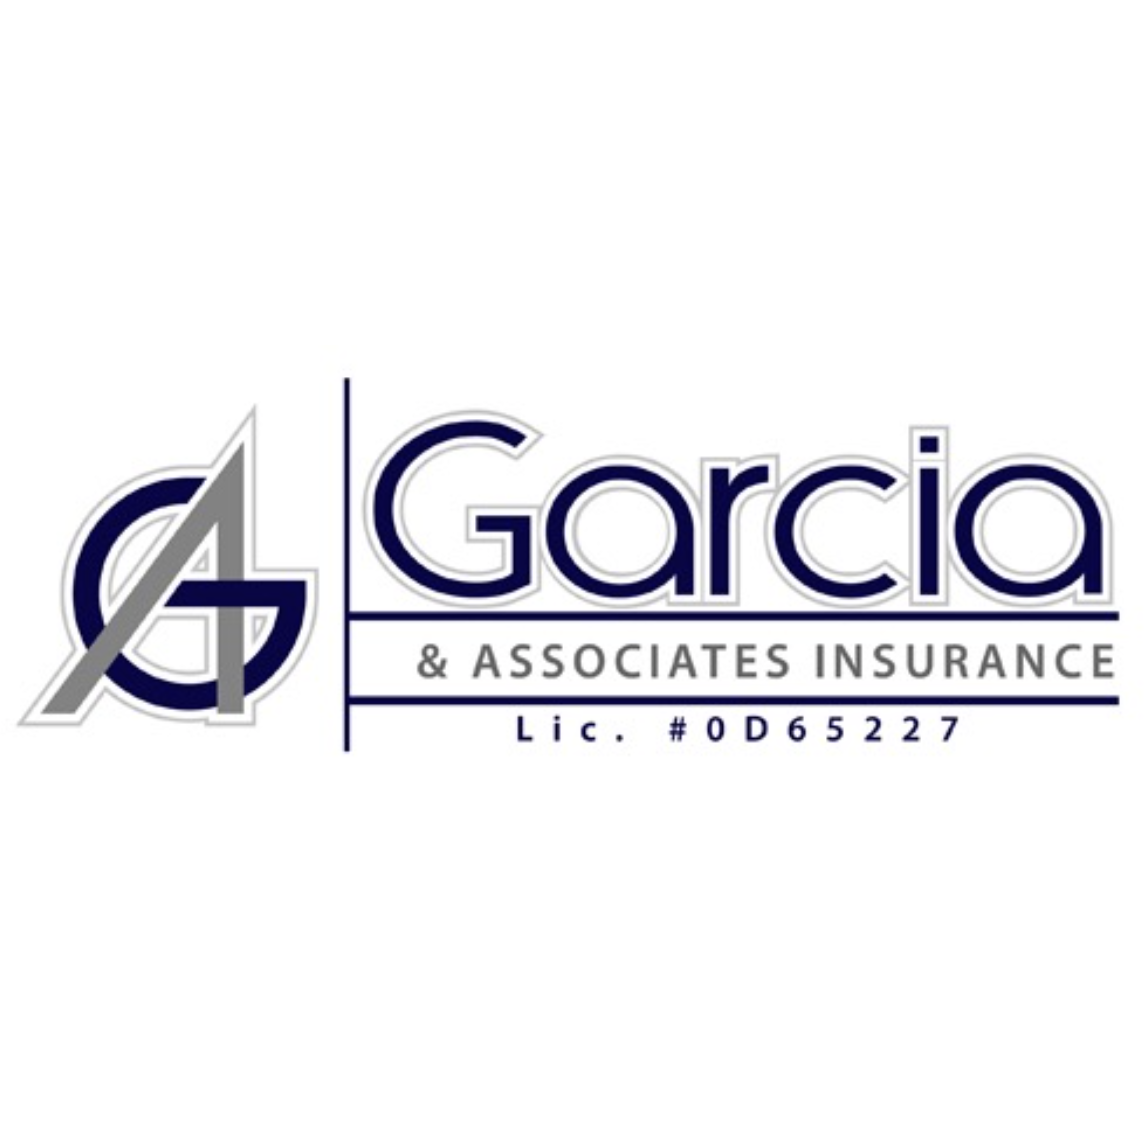 Garcia & Associates Insurance Agency, Inc.